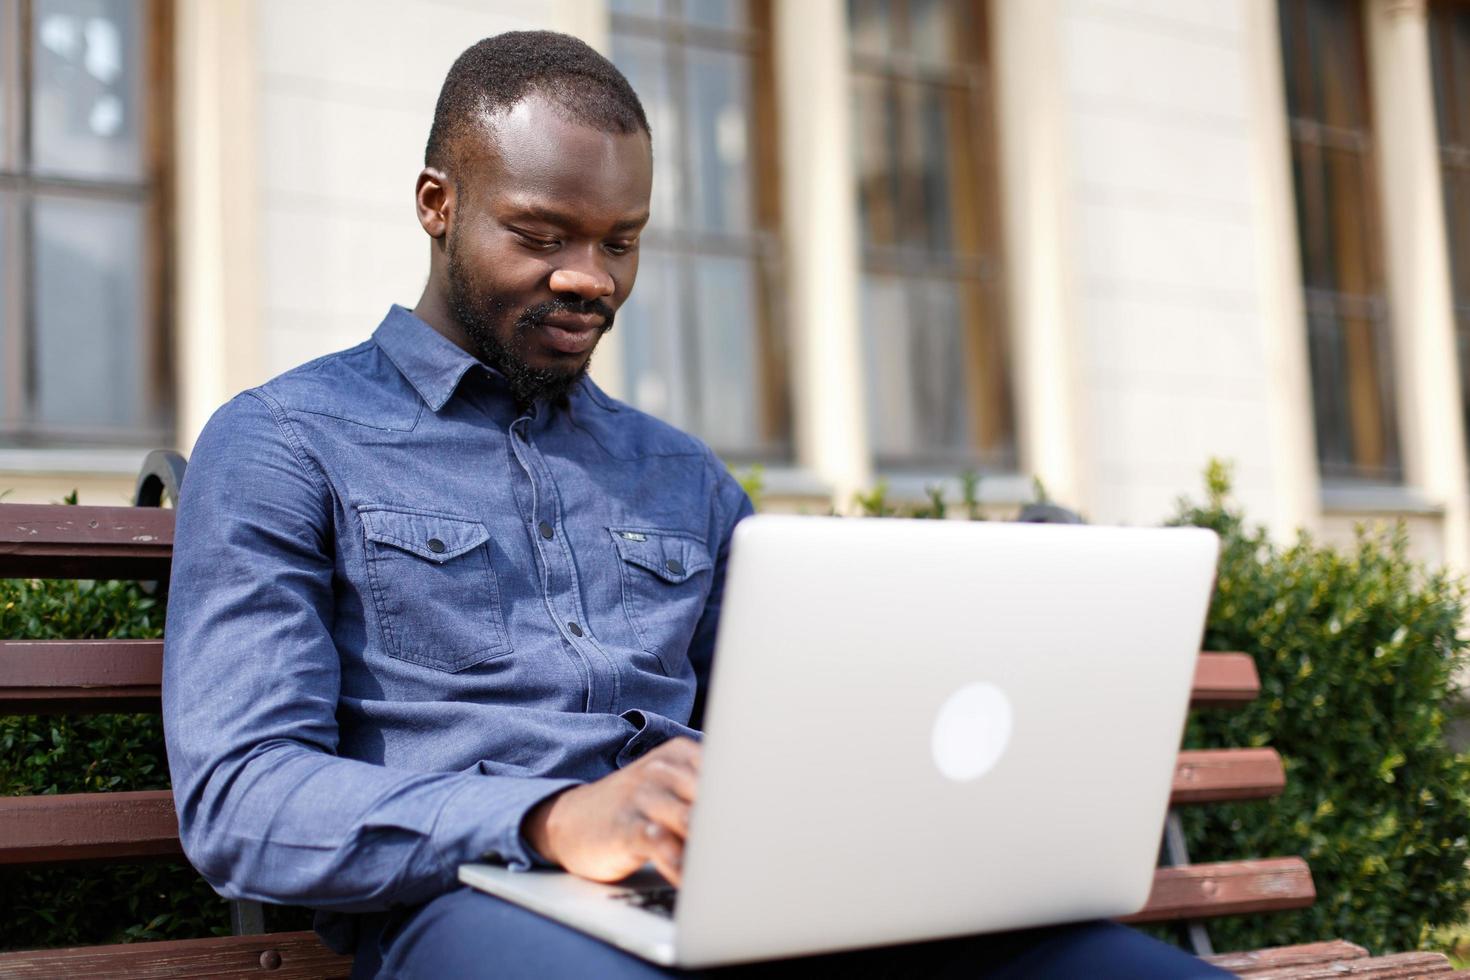 Happy man works on his laptop photo